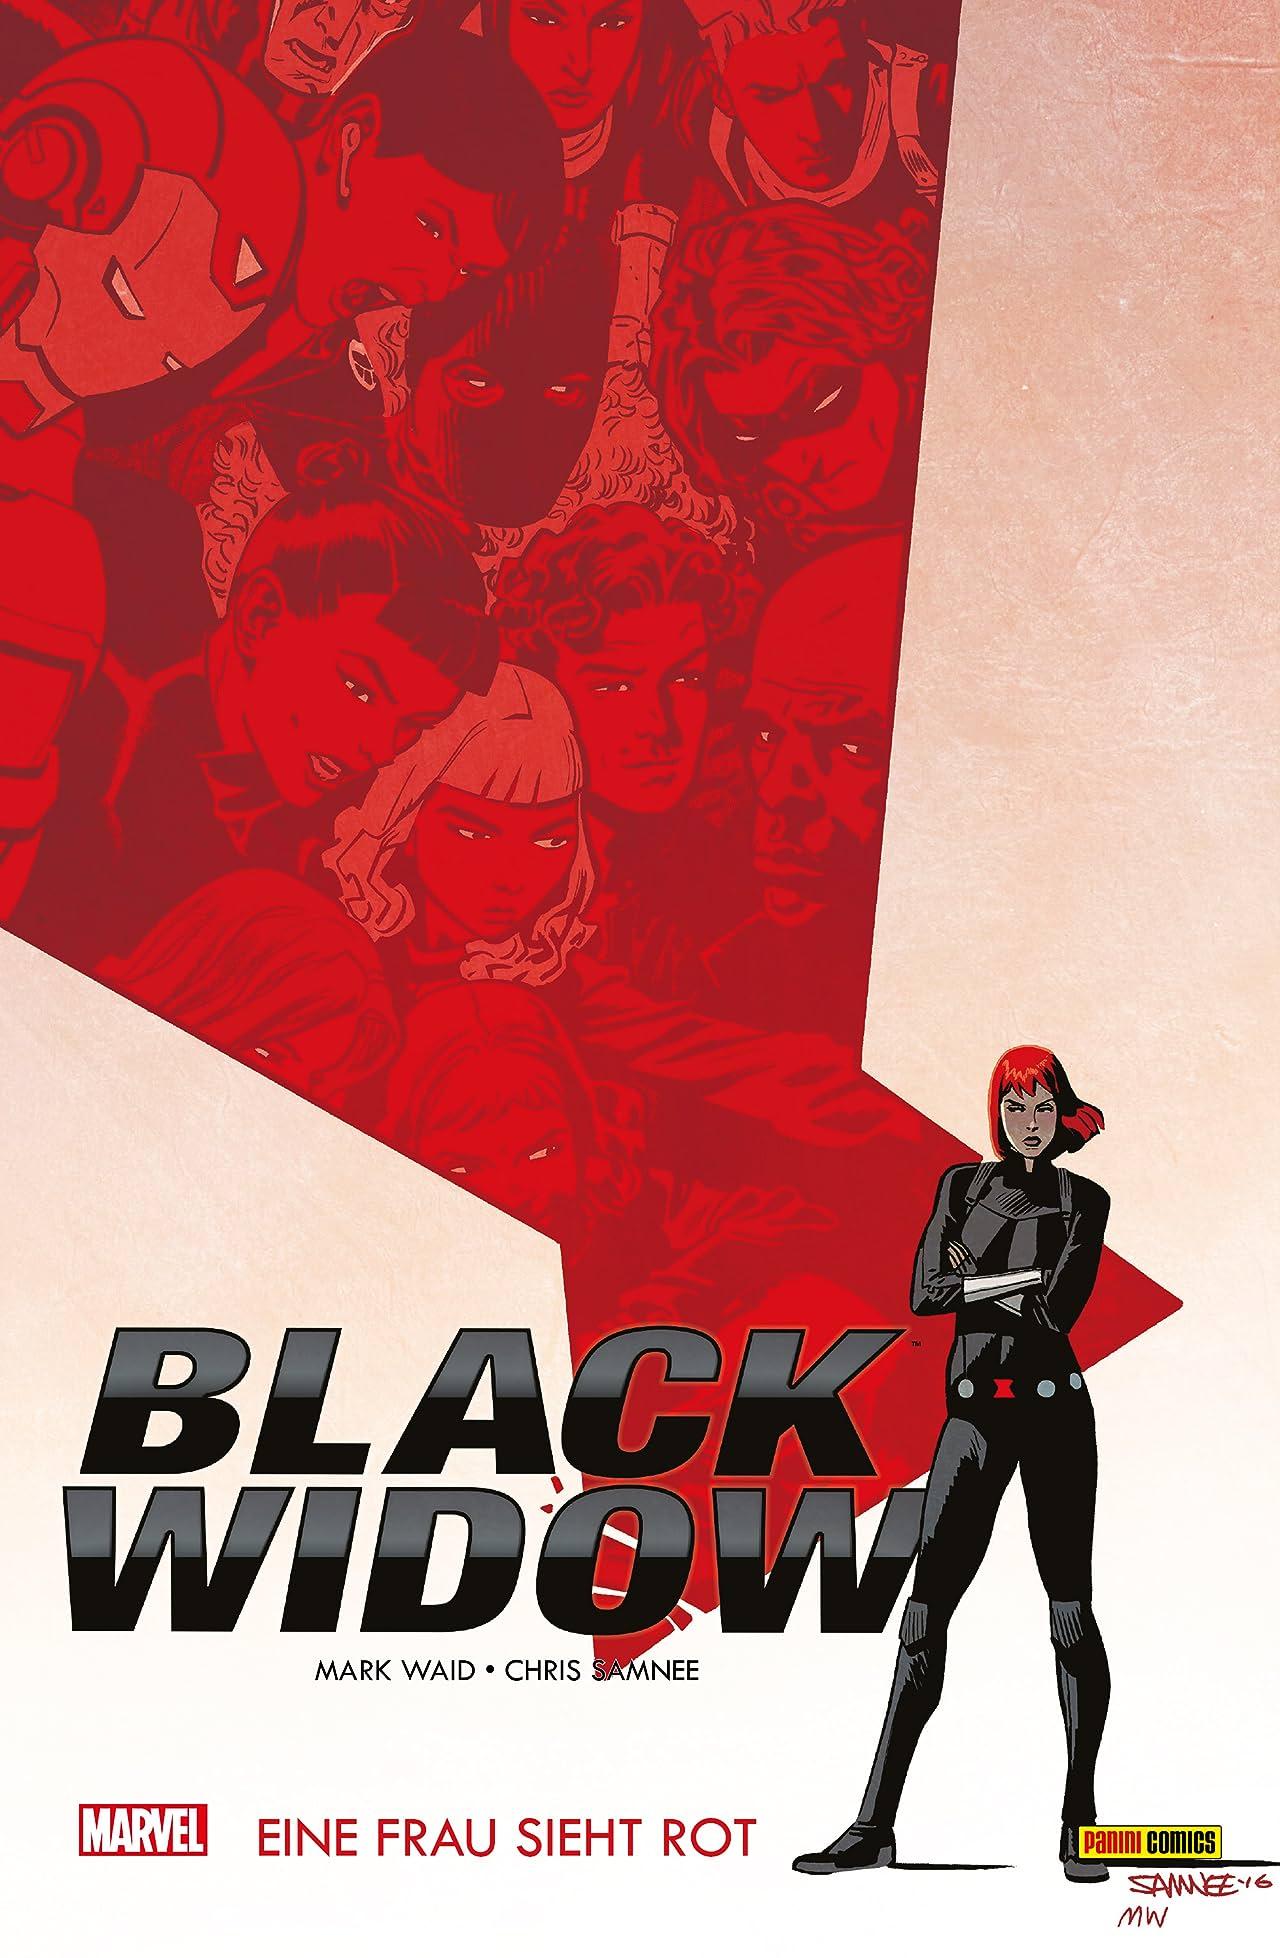 Black Widow Vol. 2: Eine Frau sieht rot